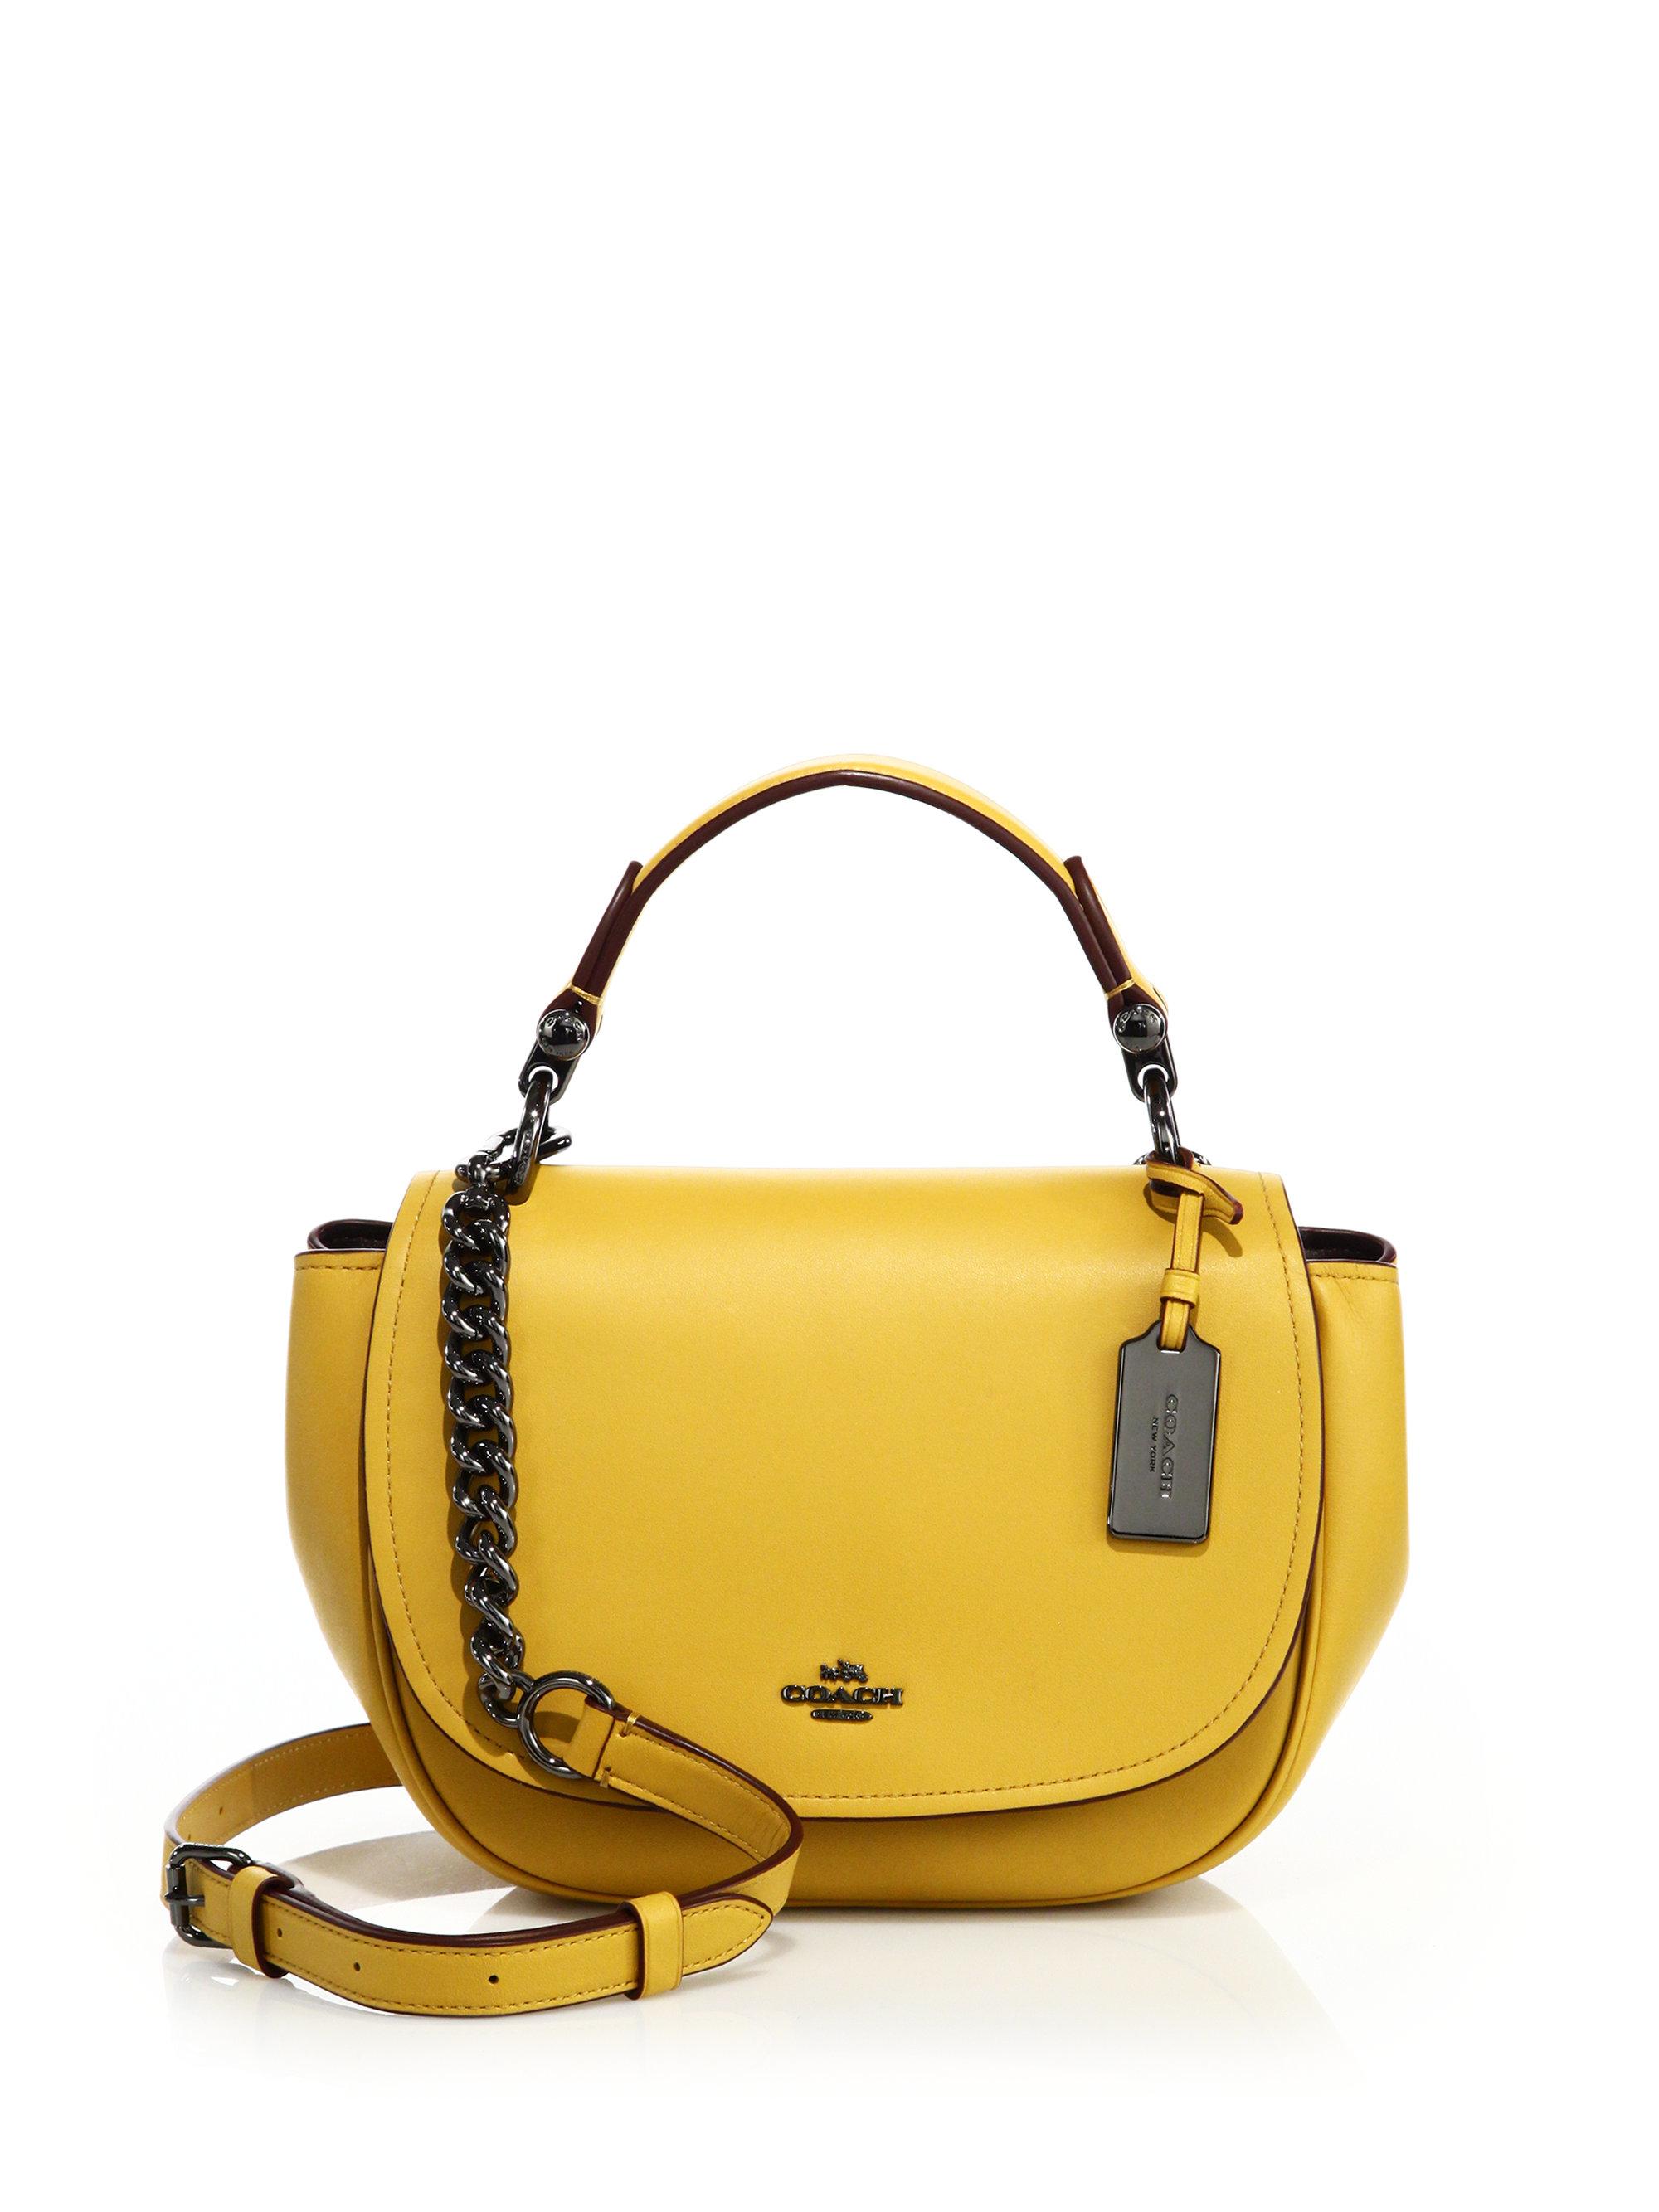 c8f12e2075a ireland coach wallets bags yellow yellow 81e9a 51fe3